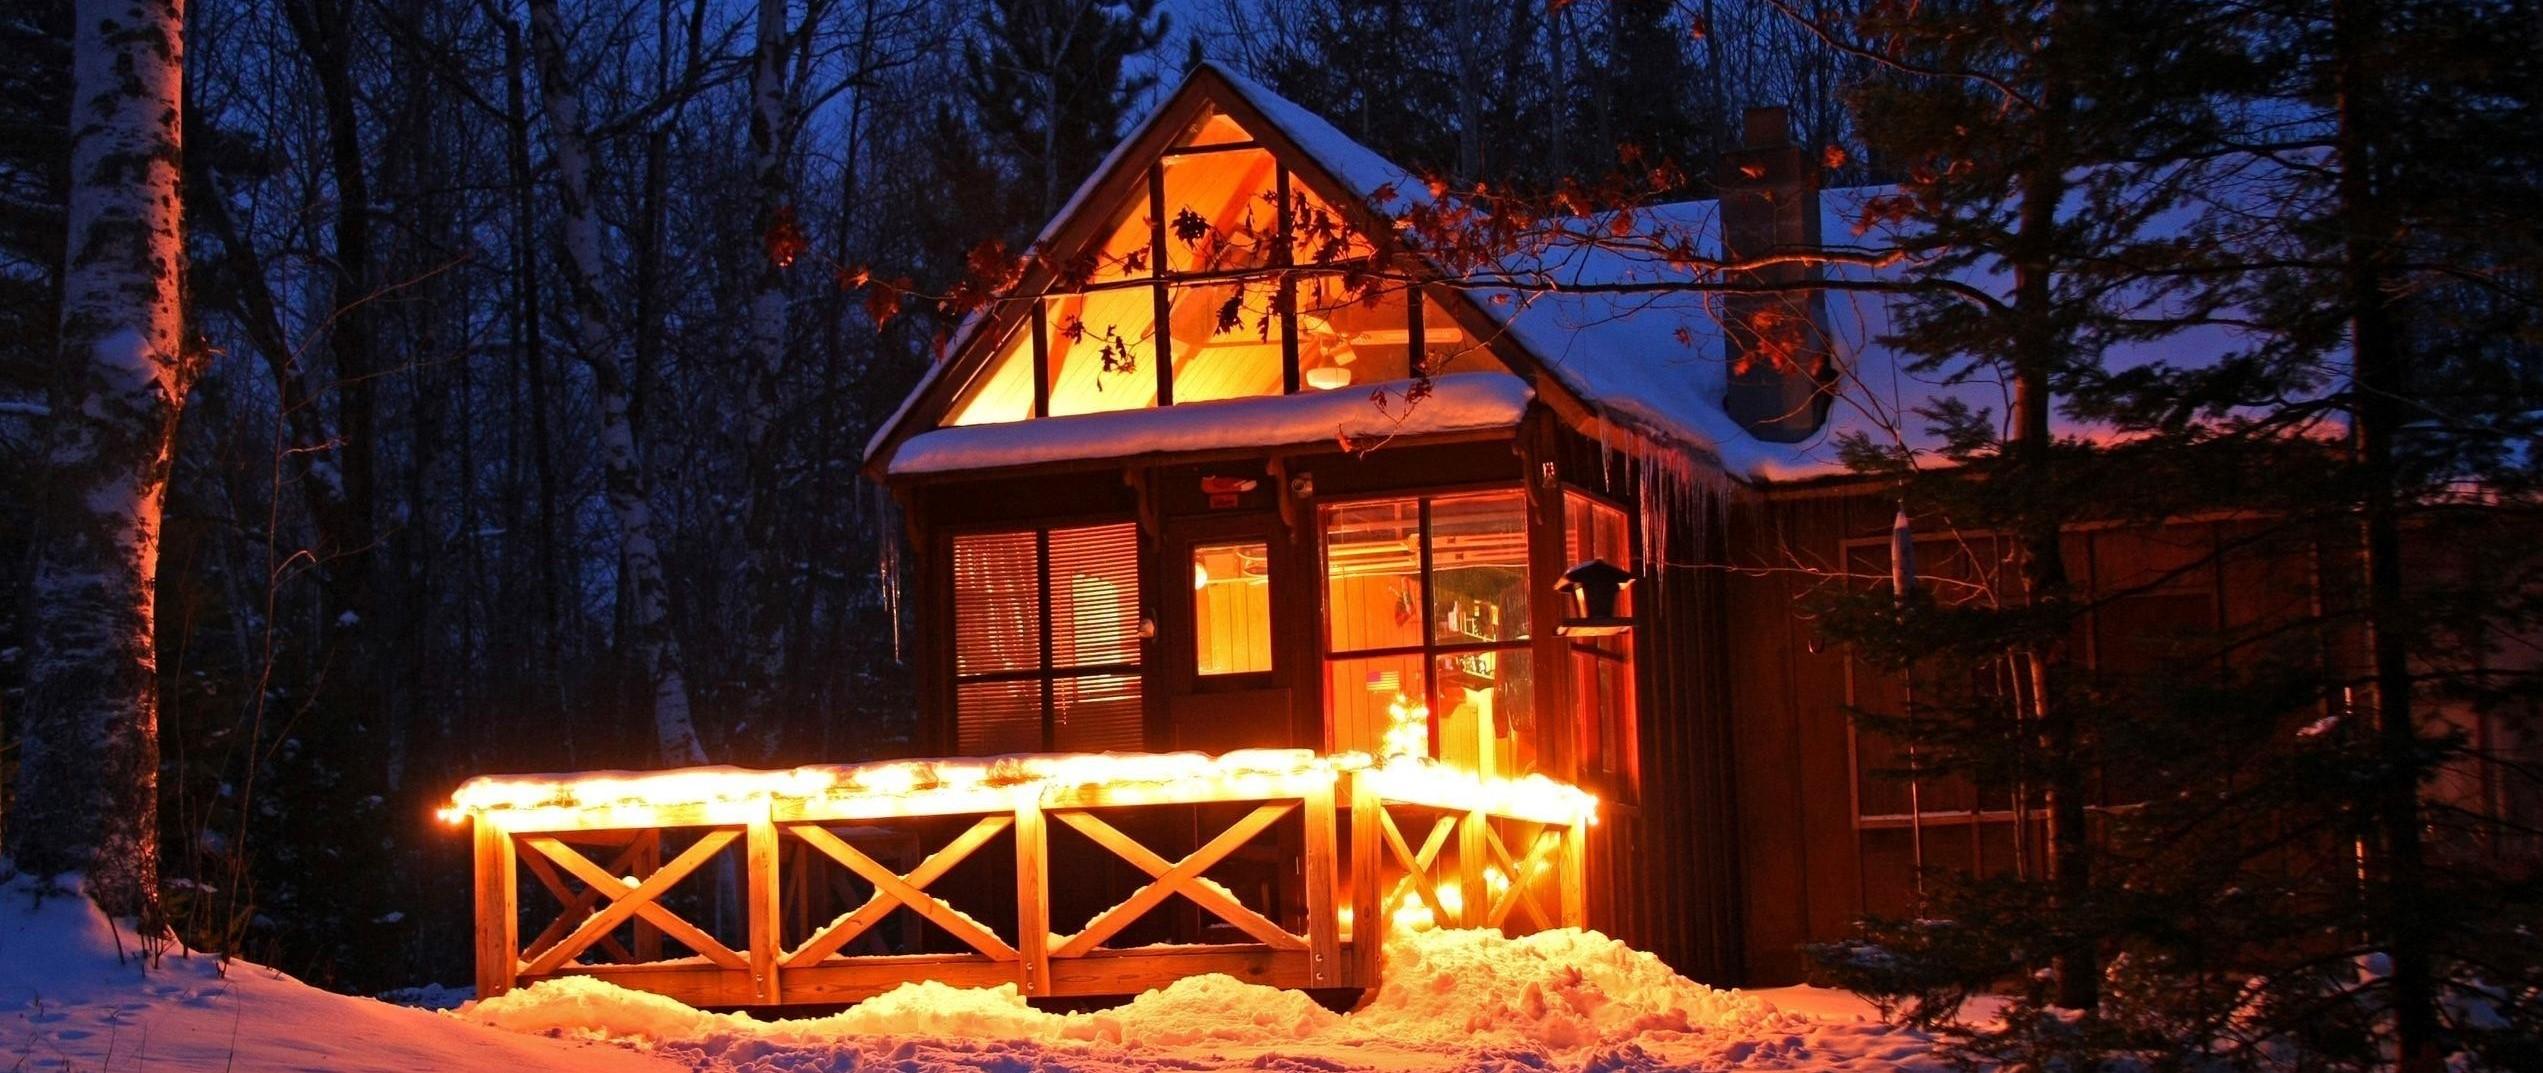 LED Hytte lys